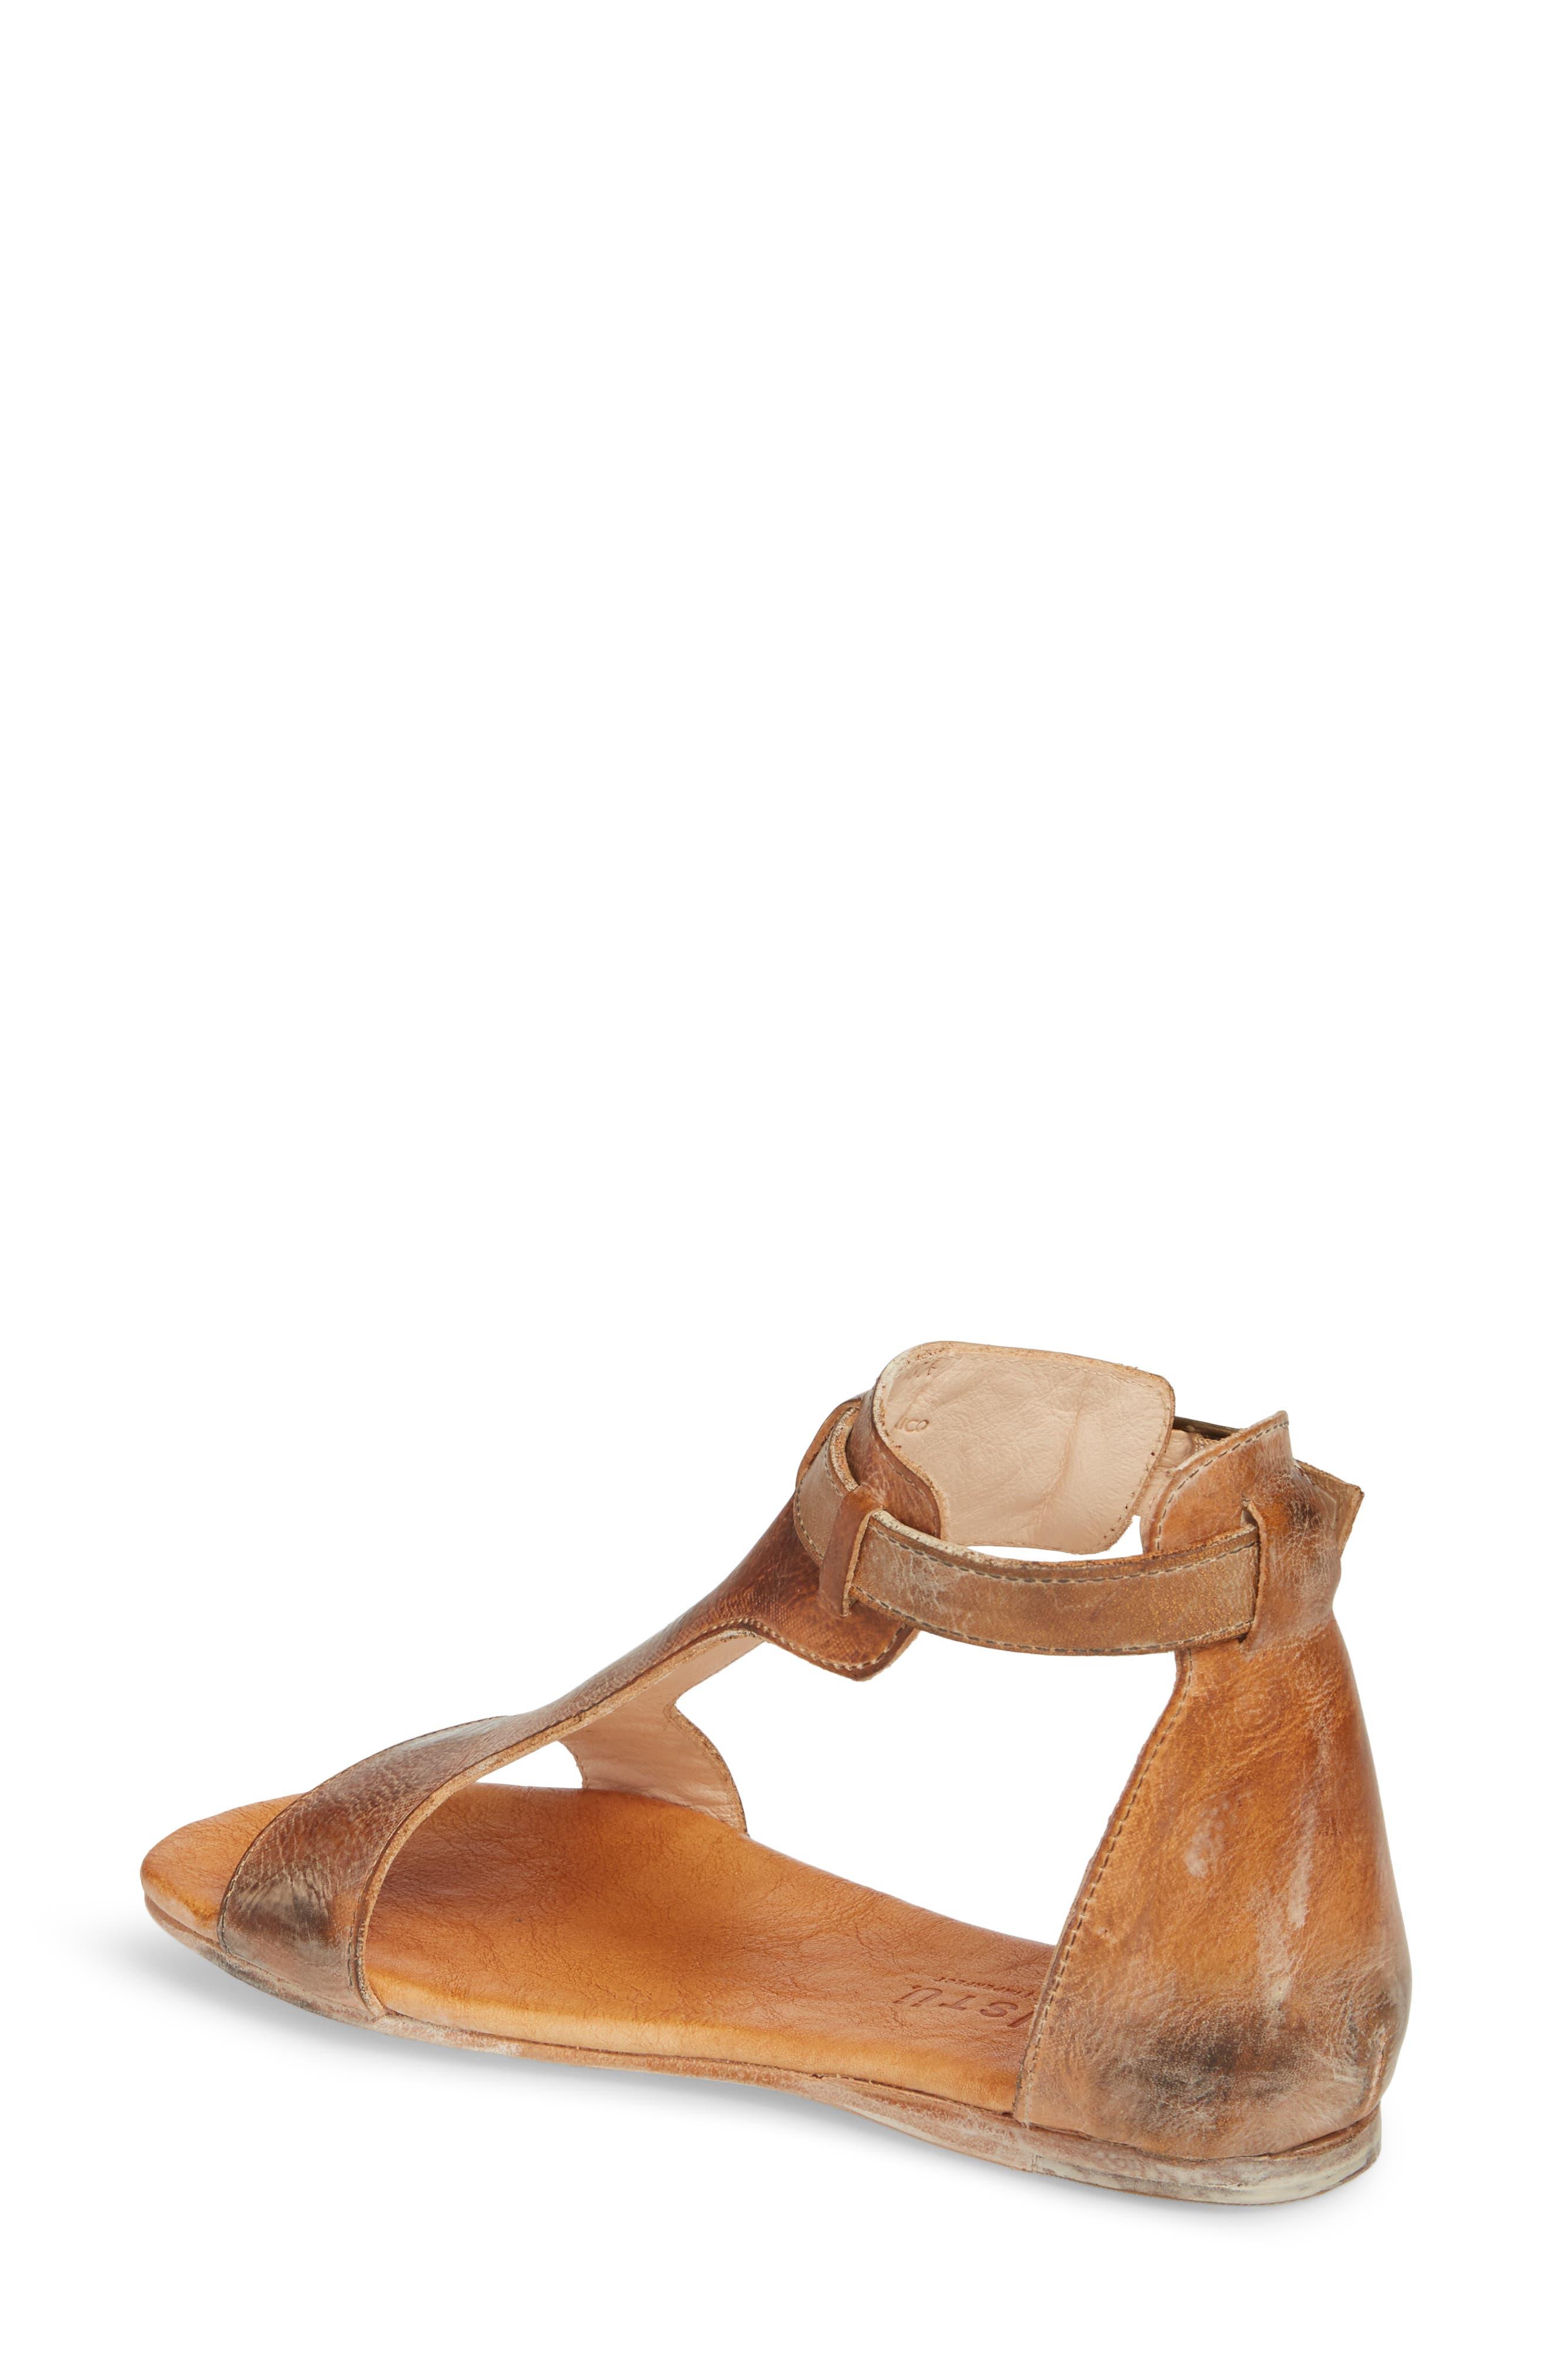 Sable Sandal,                             Alternate thumbnail 2, color,                             Tan/ White Leather